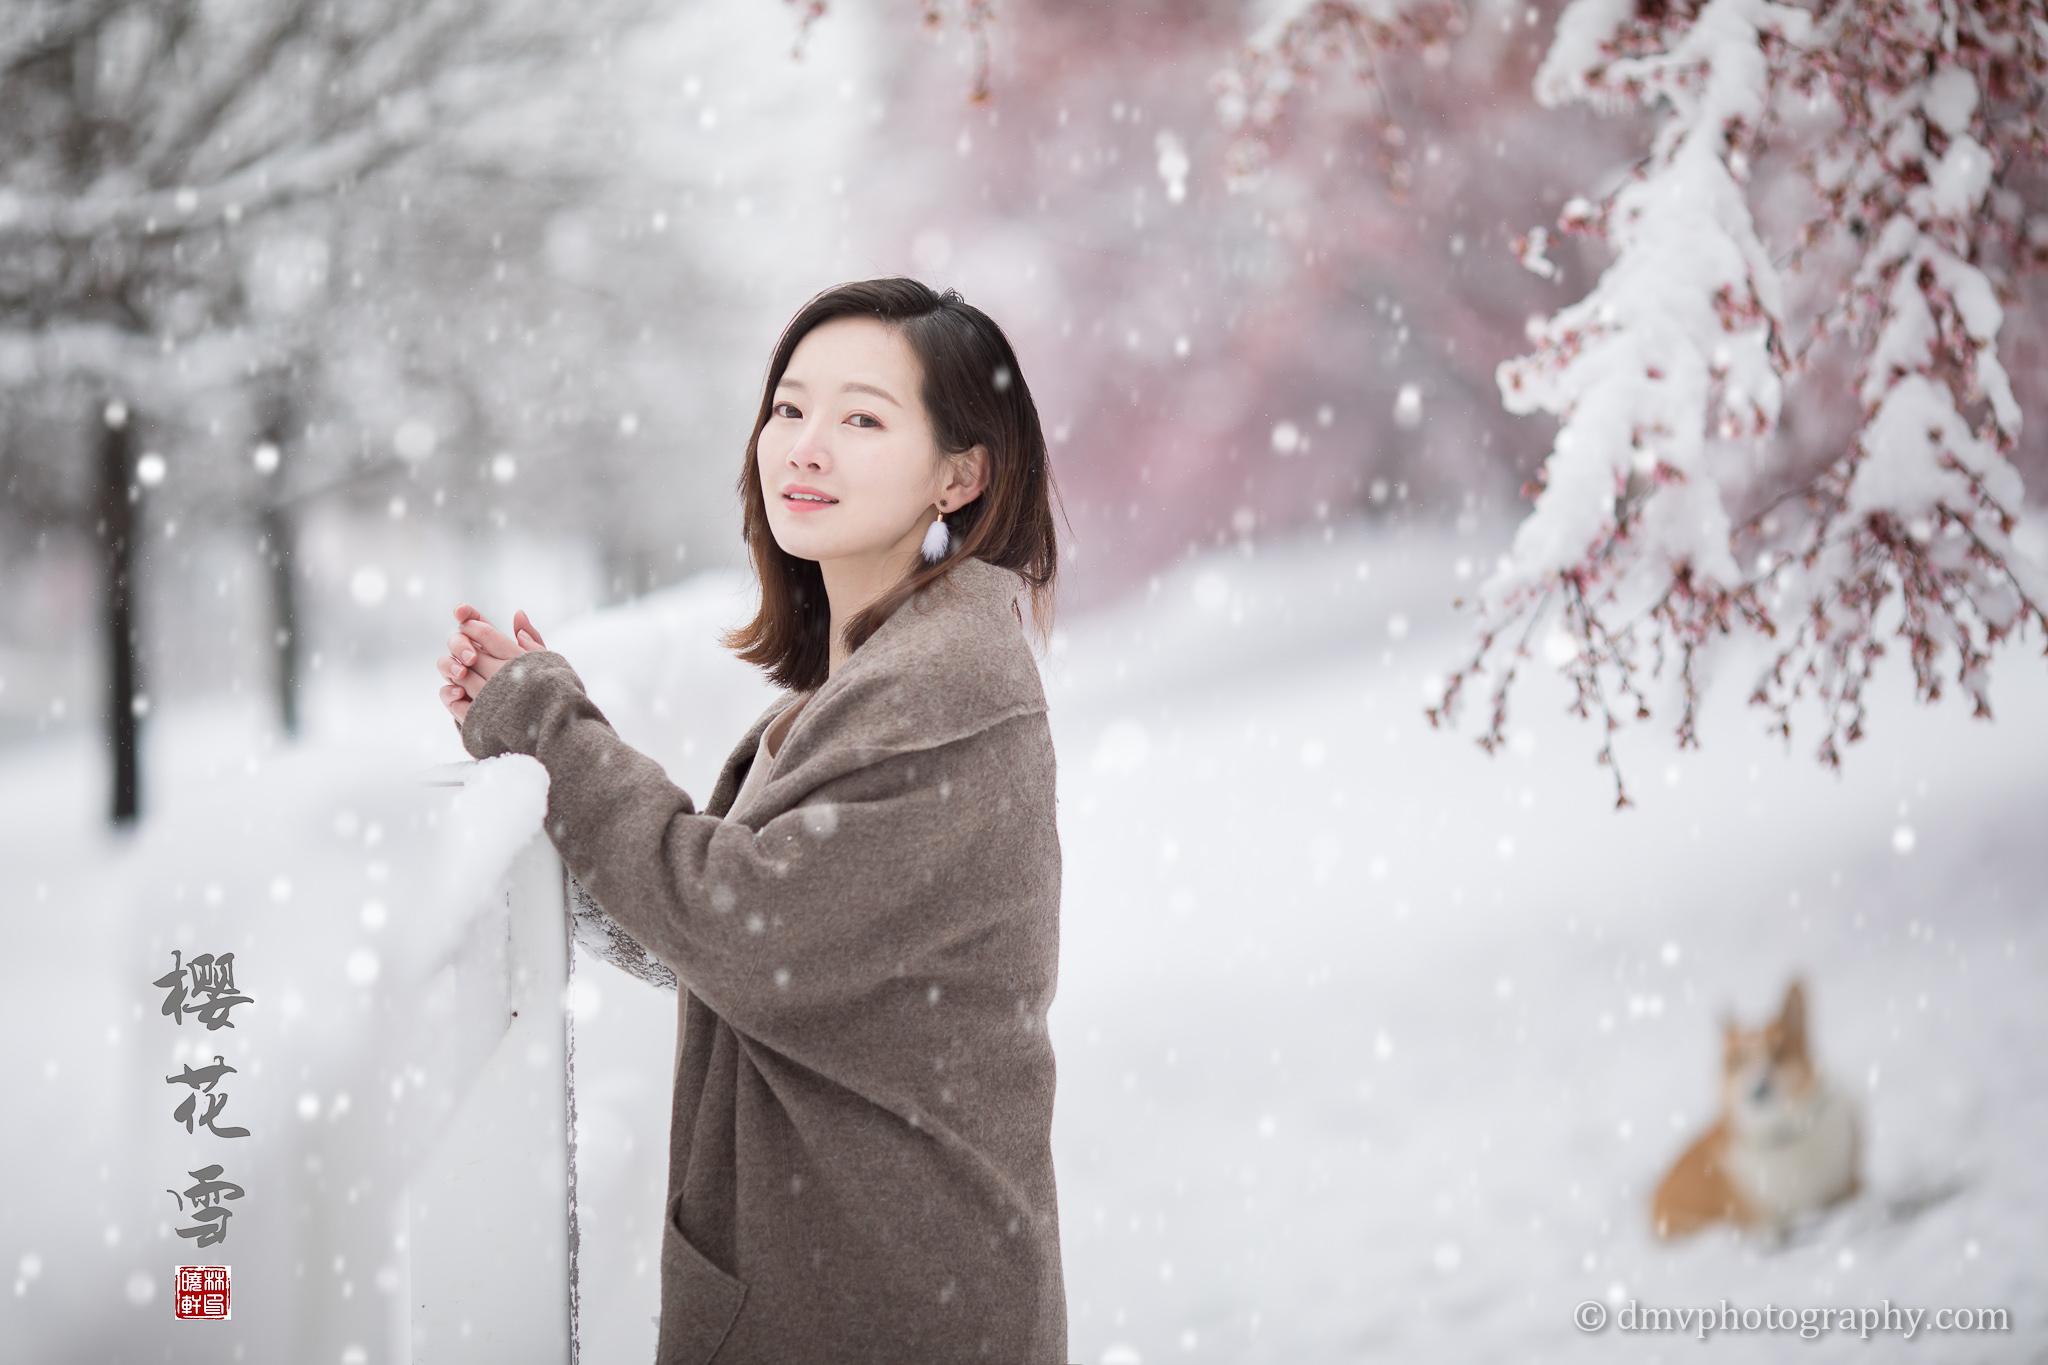 _D4_8567-snow